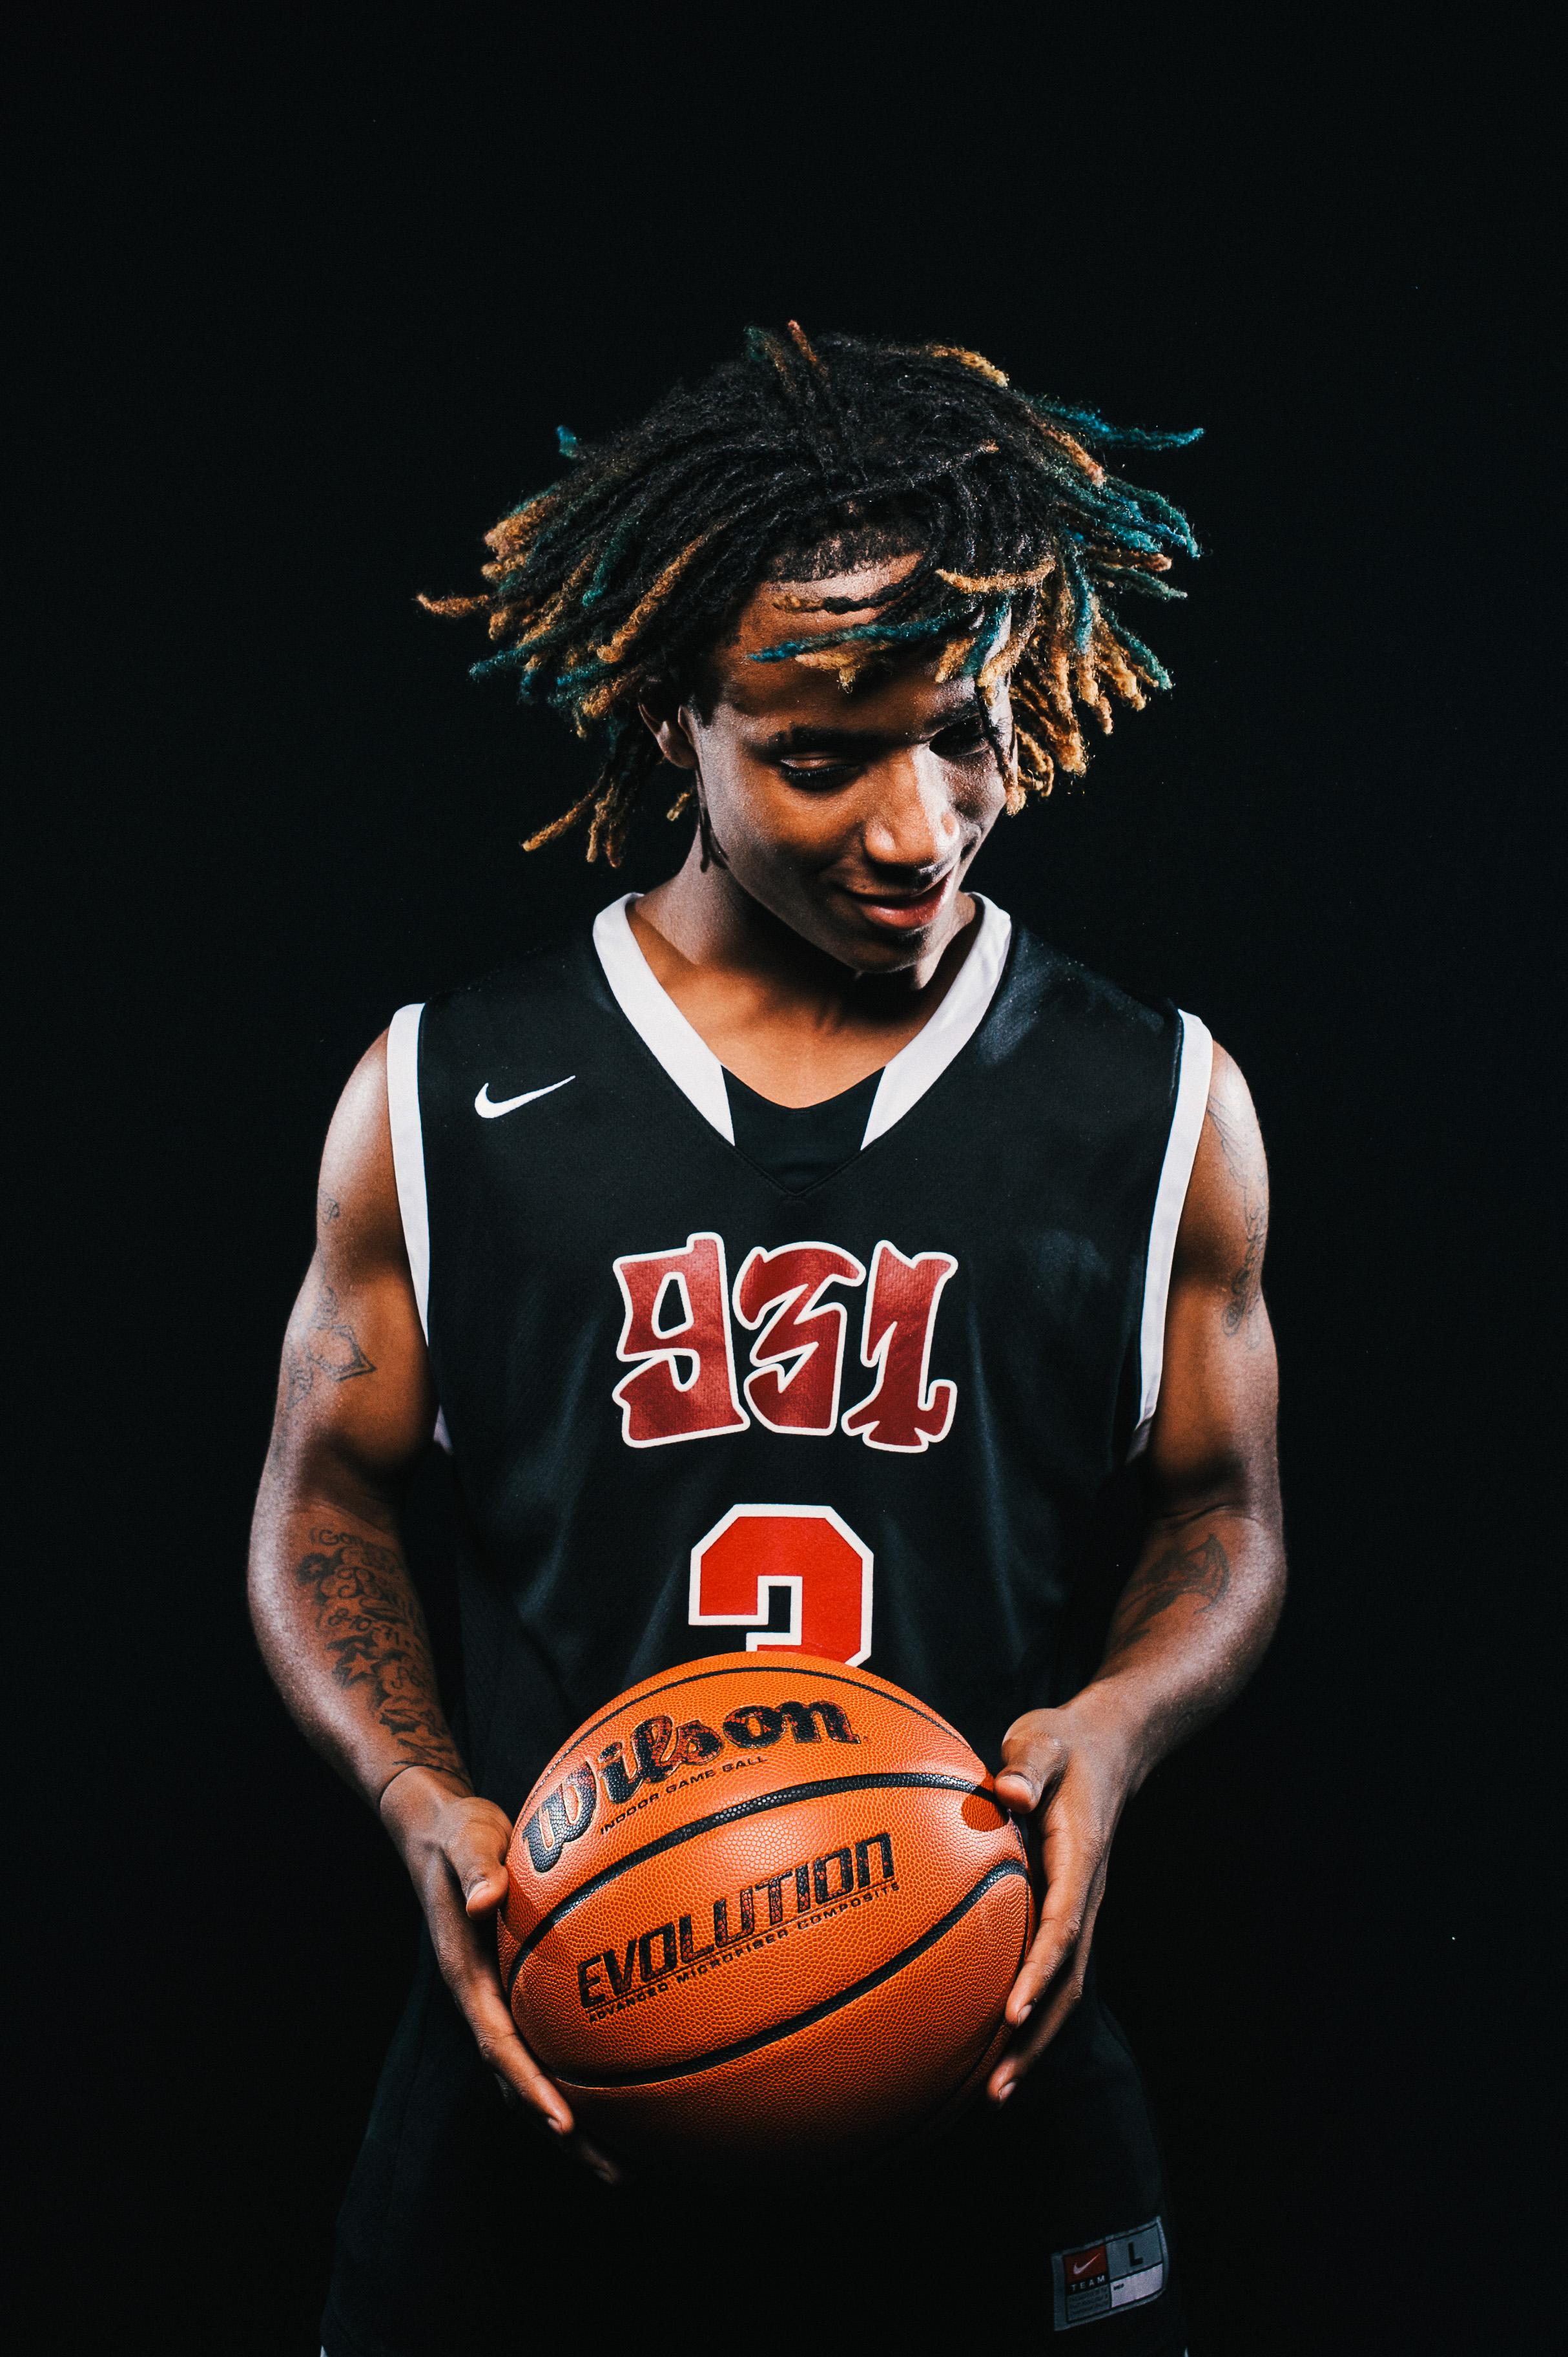 931-basketball-portraits-2014-210837.jpg